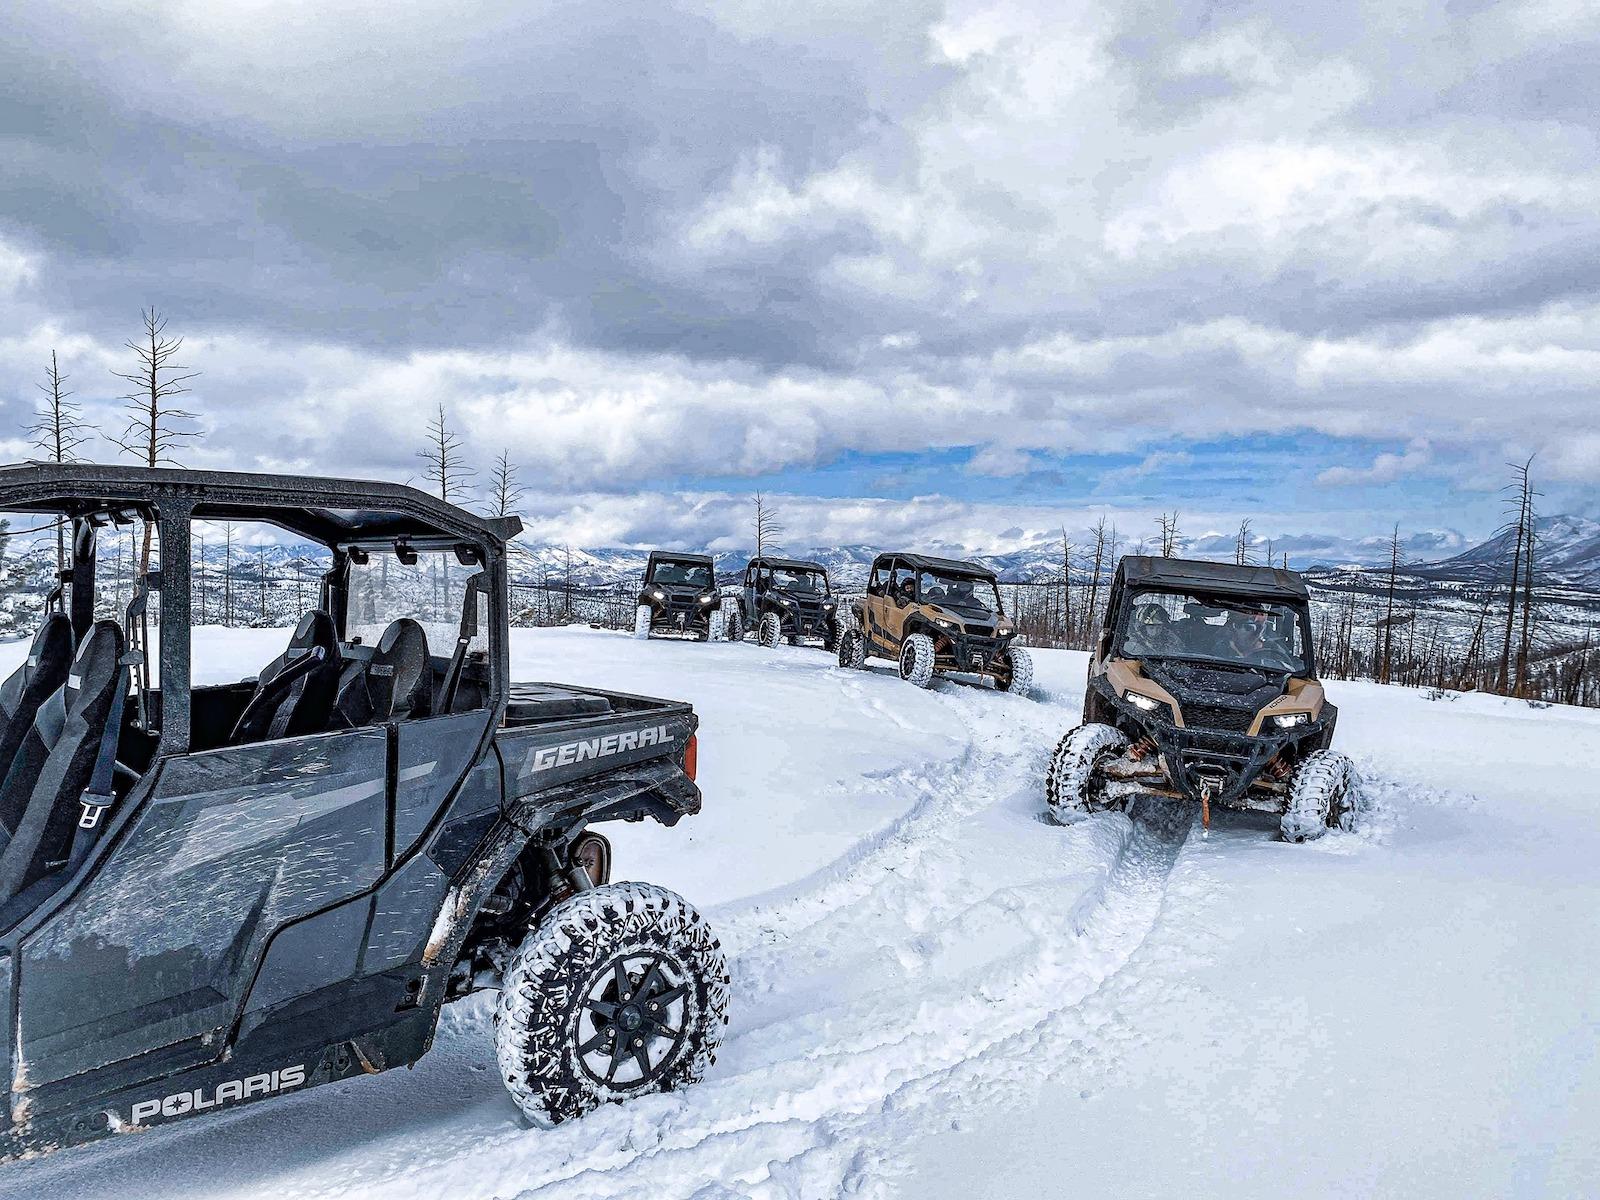 Image of snowy UTVs driving in colorado